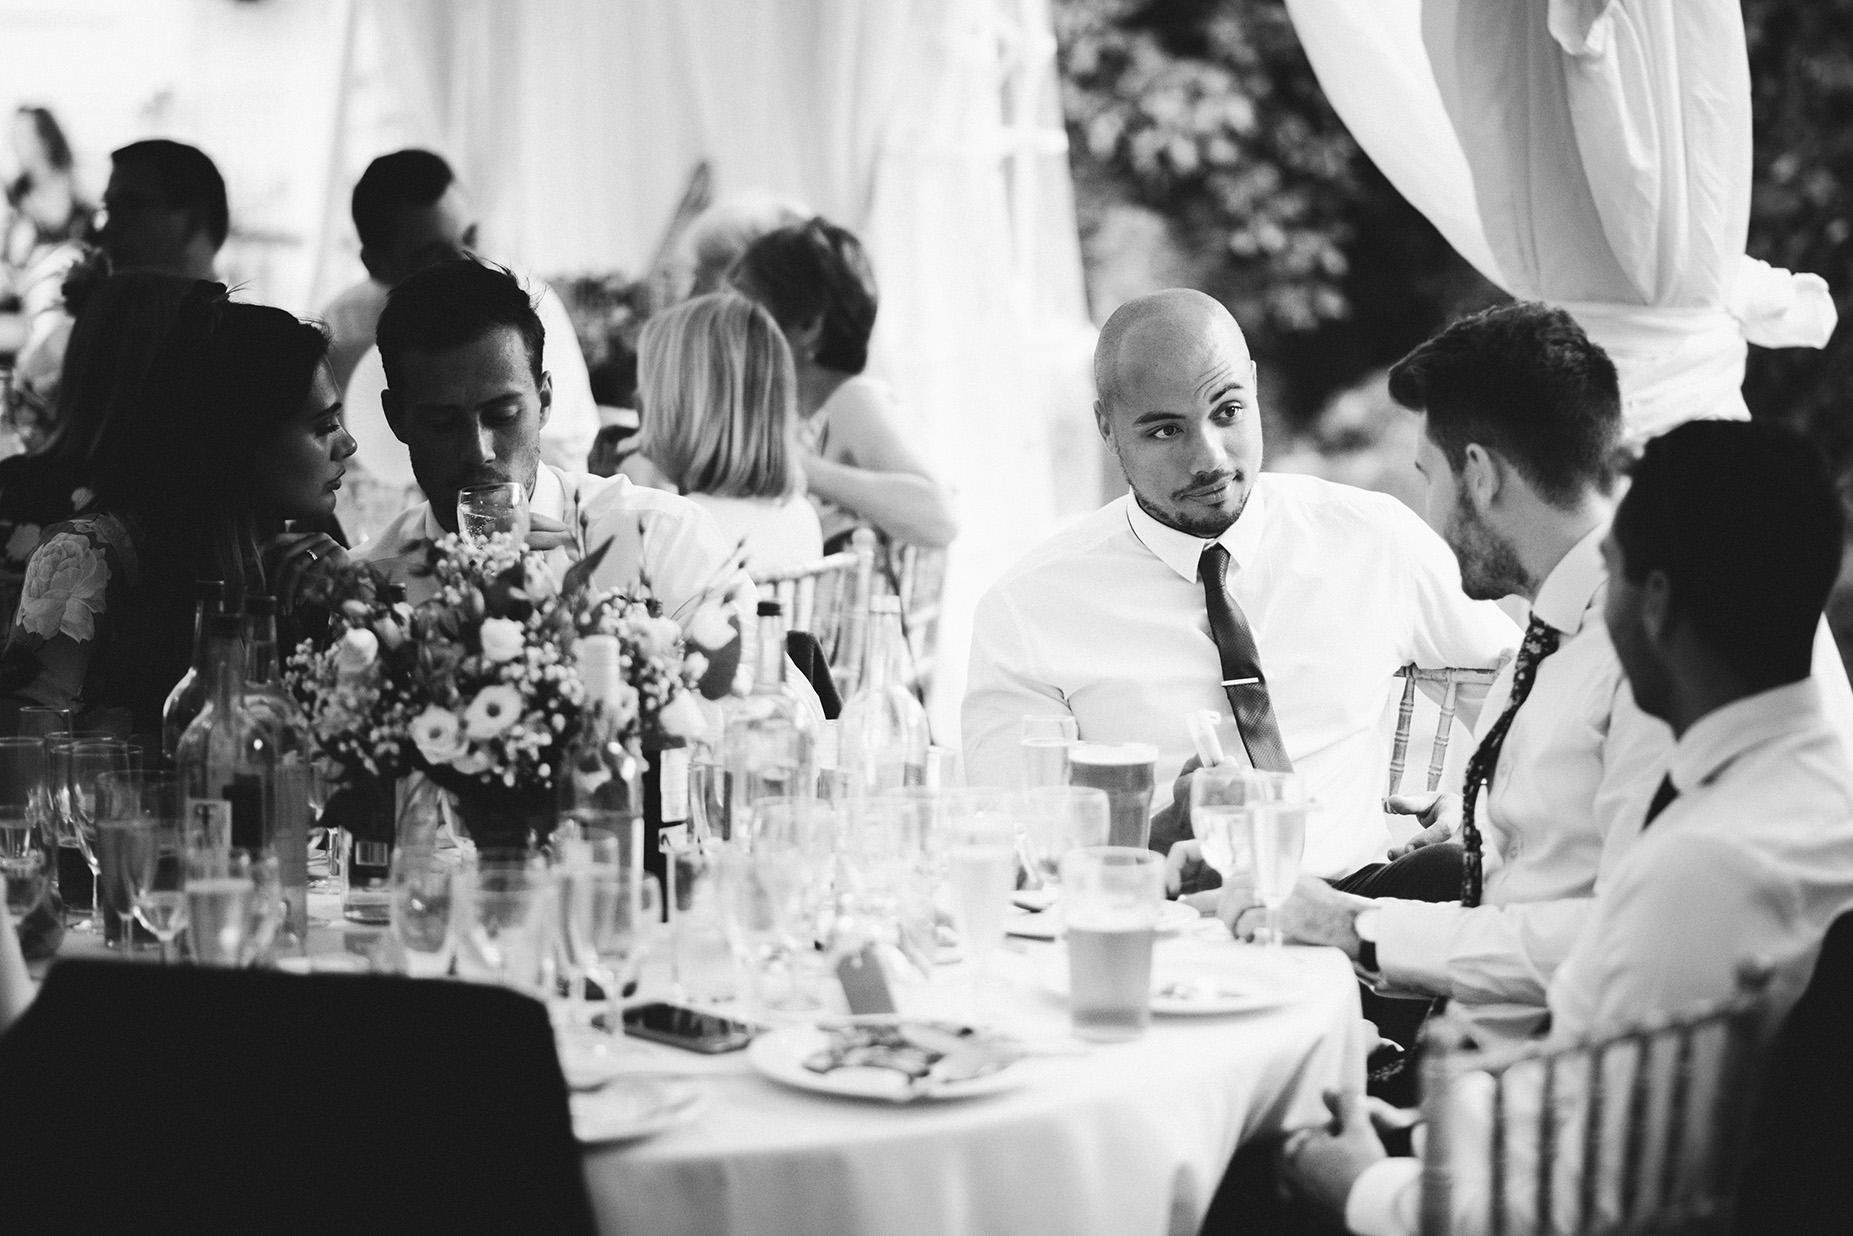 scott-stockwell-photography-wedding-35.jpg